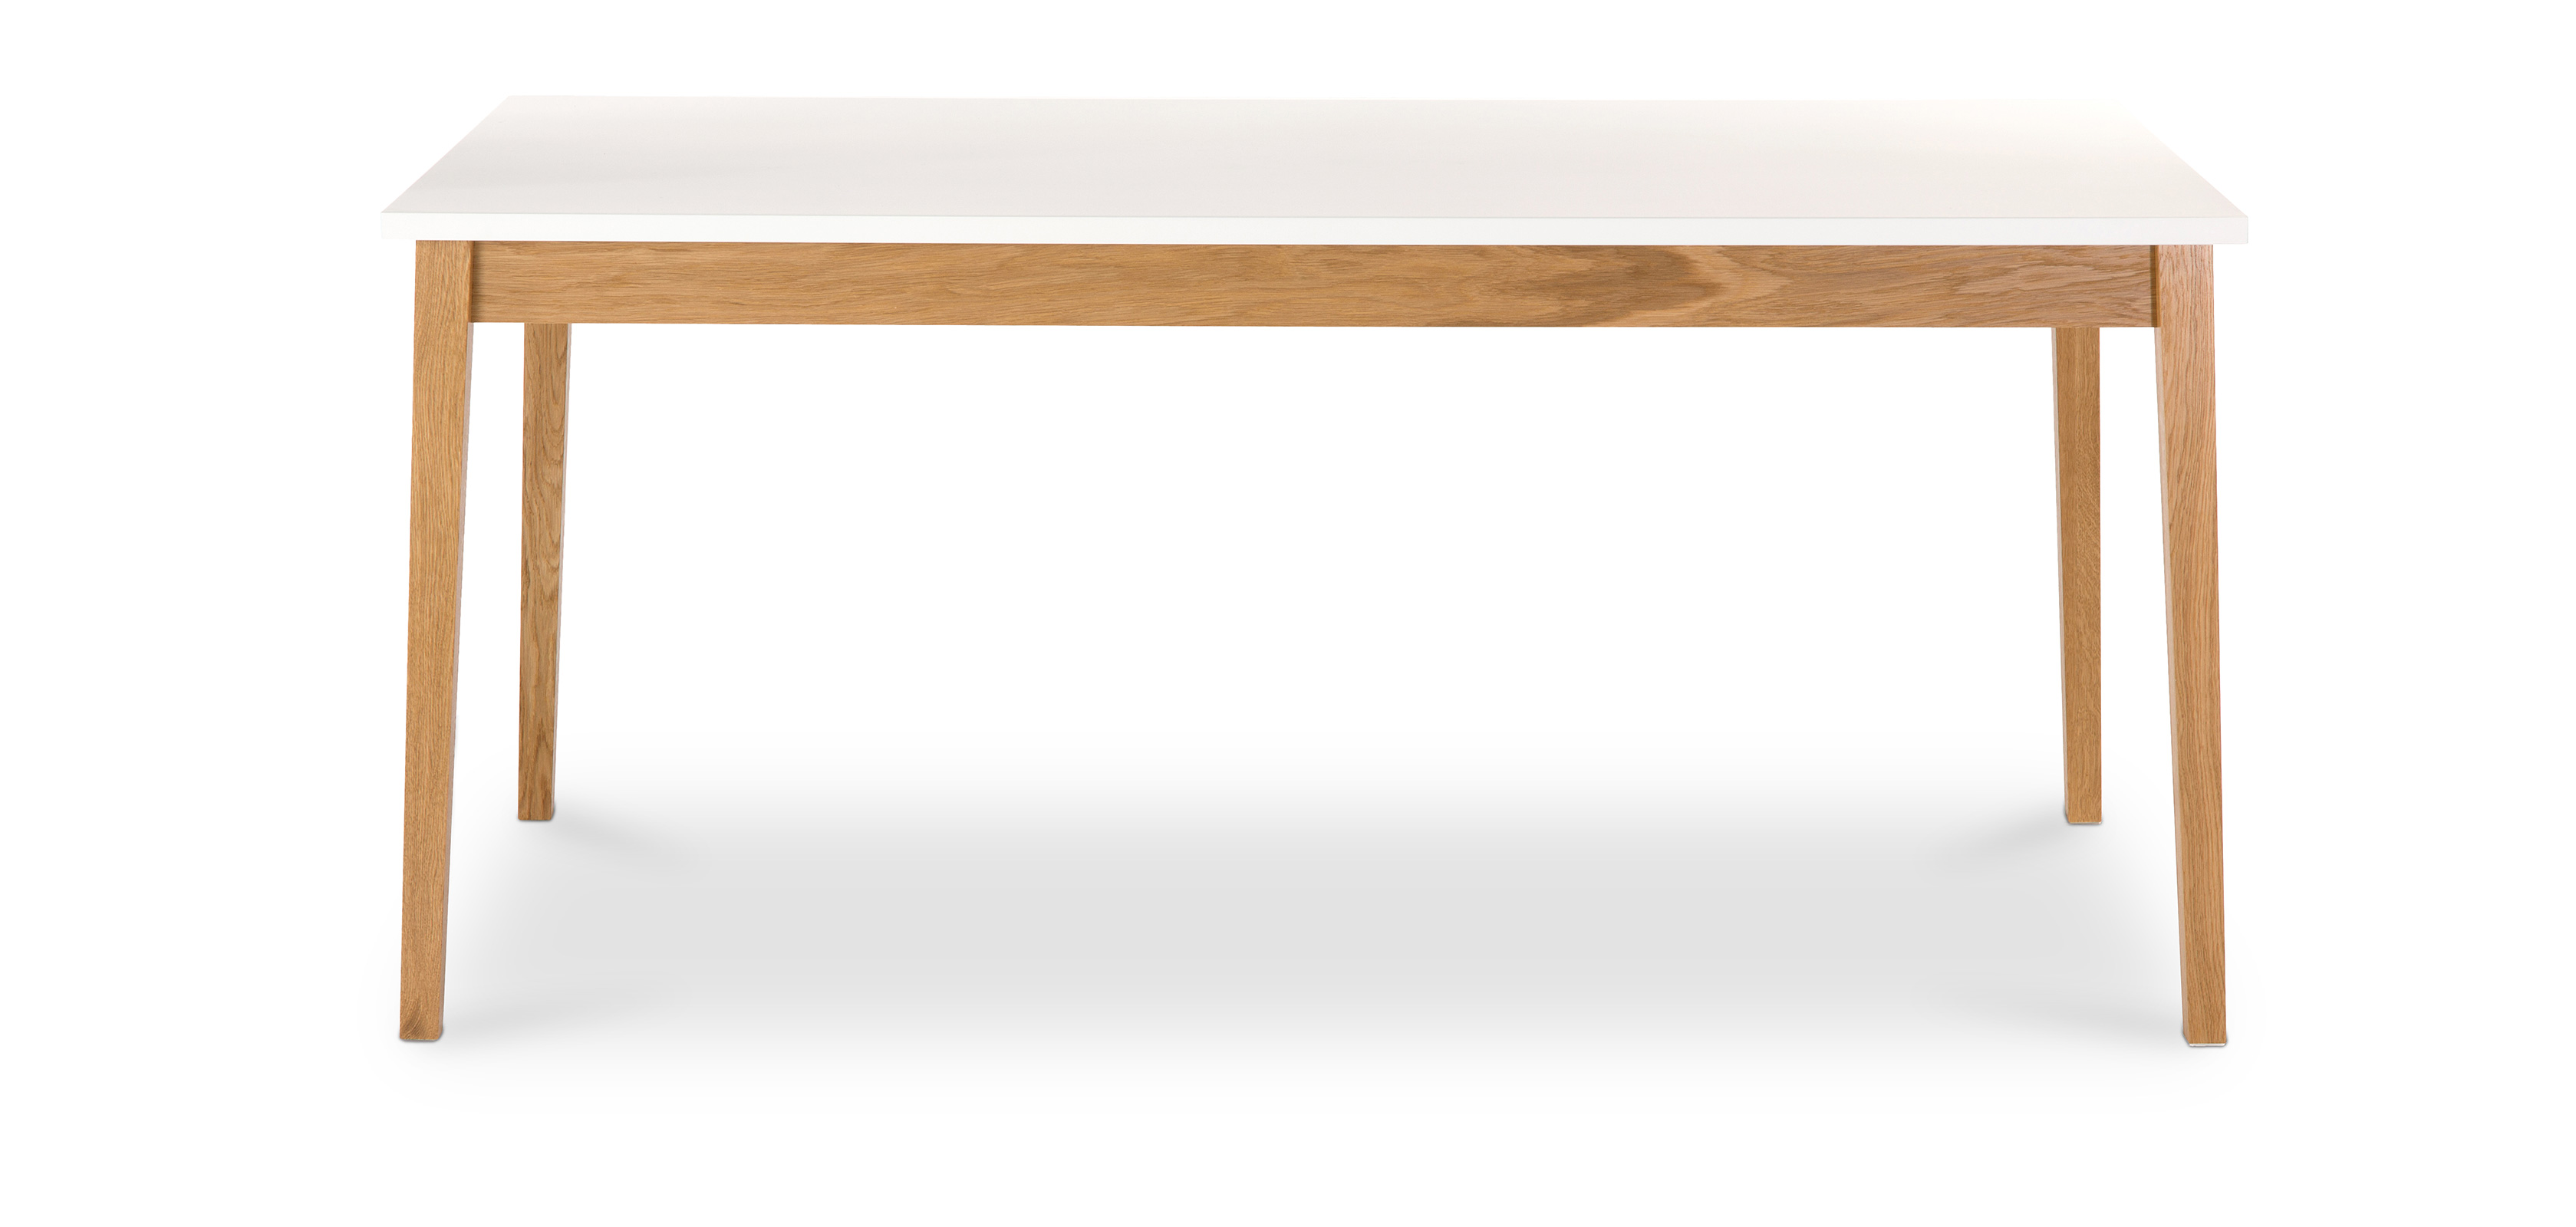 Tavolo da pranzo in stile scandinavo - Tavolo scandinavo ...